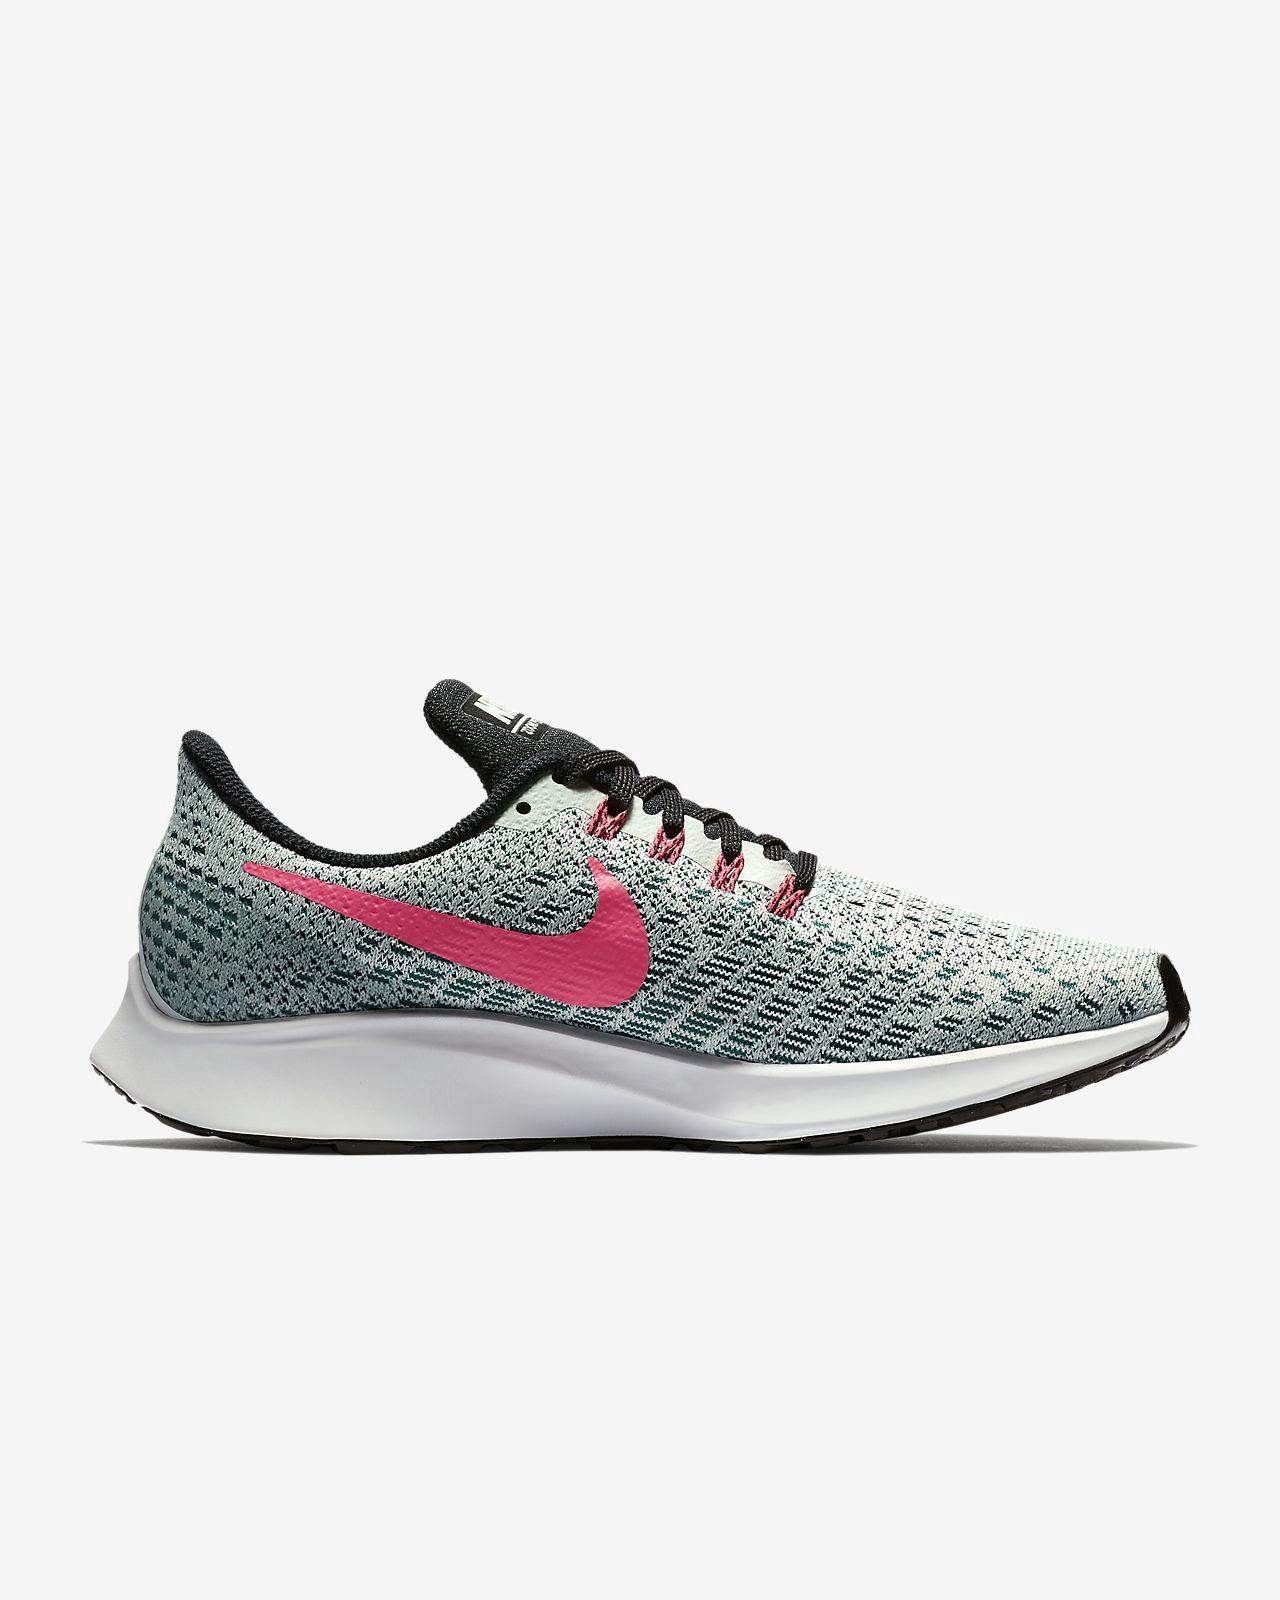 163e33ff326 Nike Air Zoom Pegasus 35 Women's Running Shoe - 11.5 | Products ...